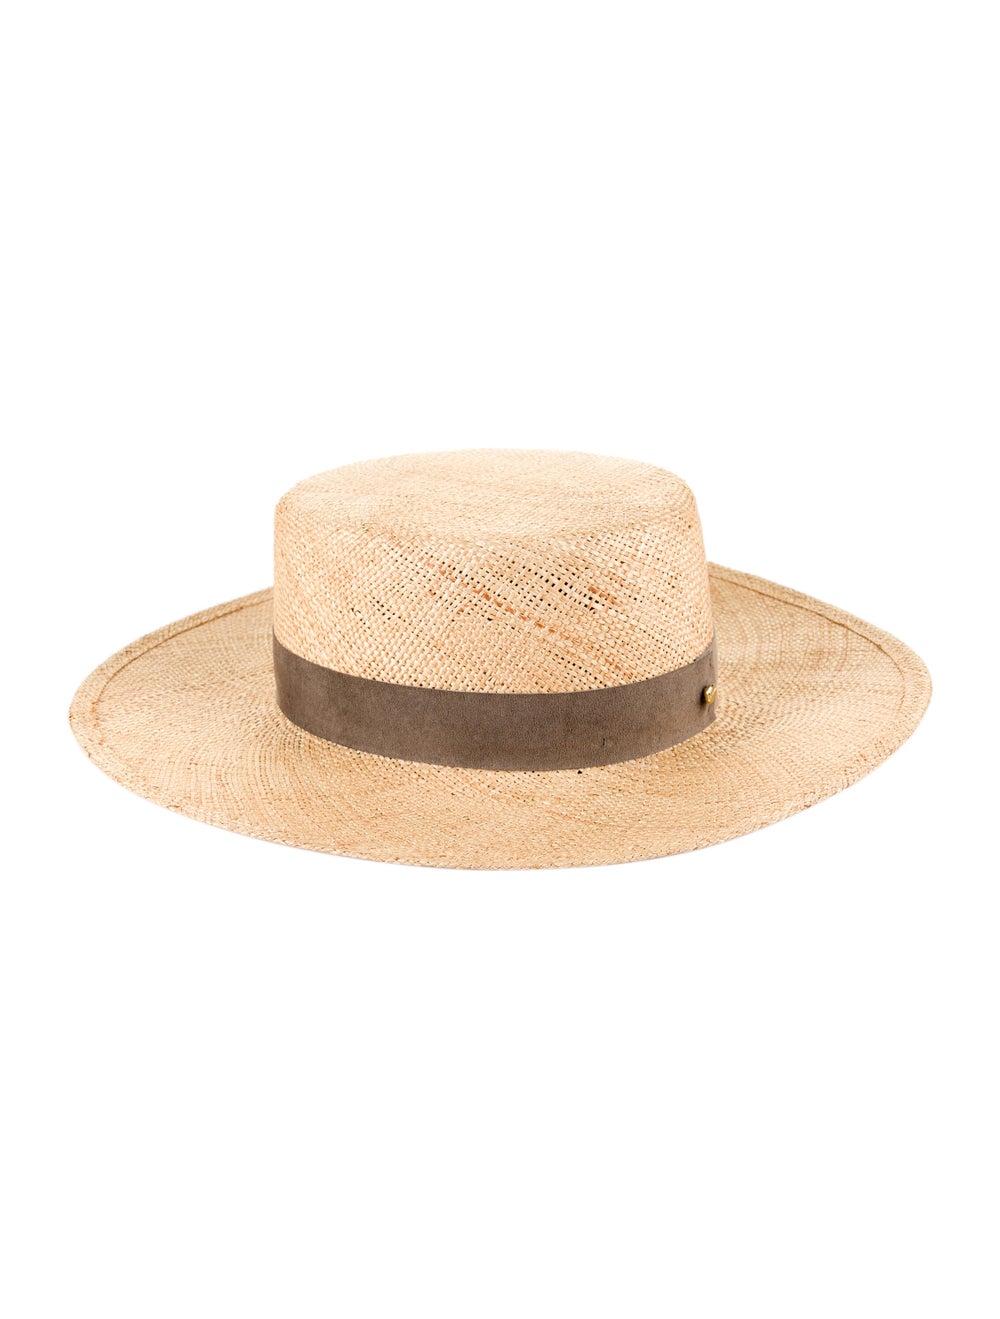 Janessa Leone Wide Brim Straw Hat yellow - image 2